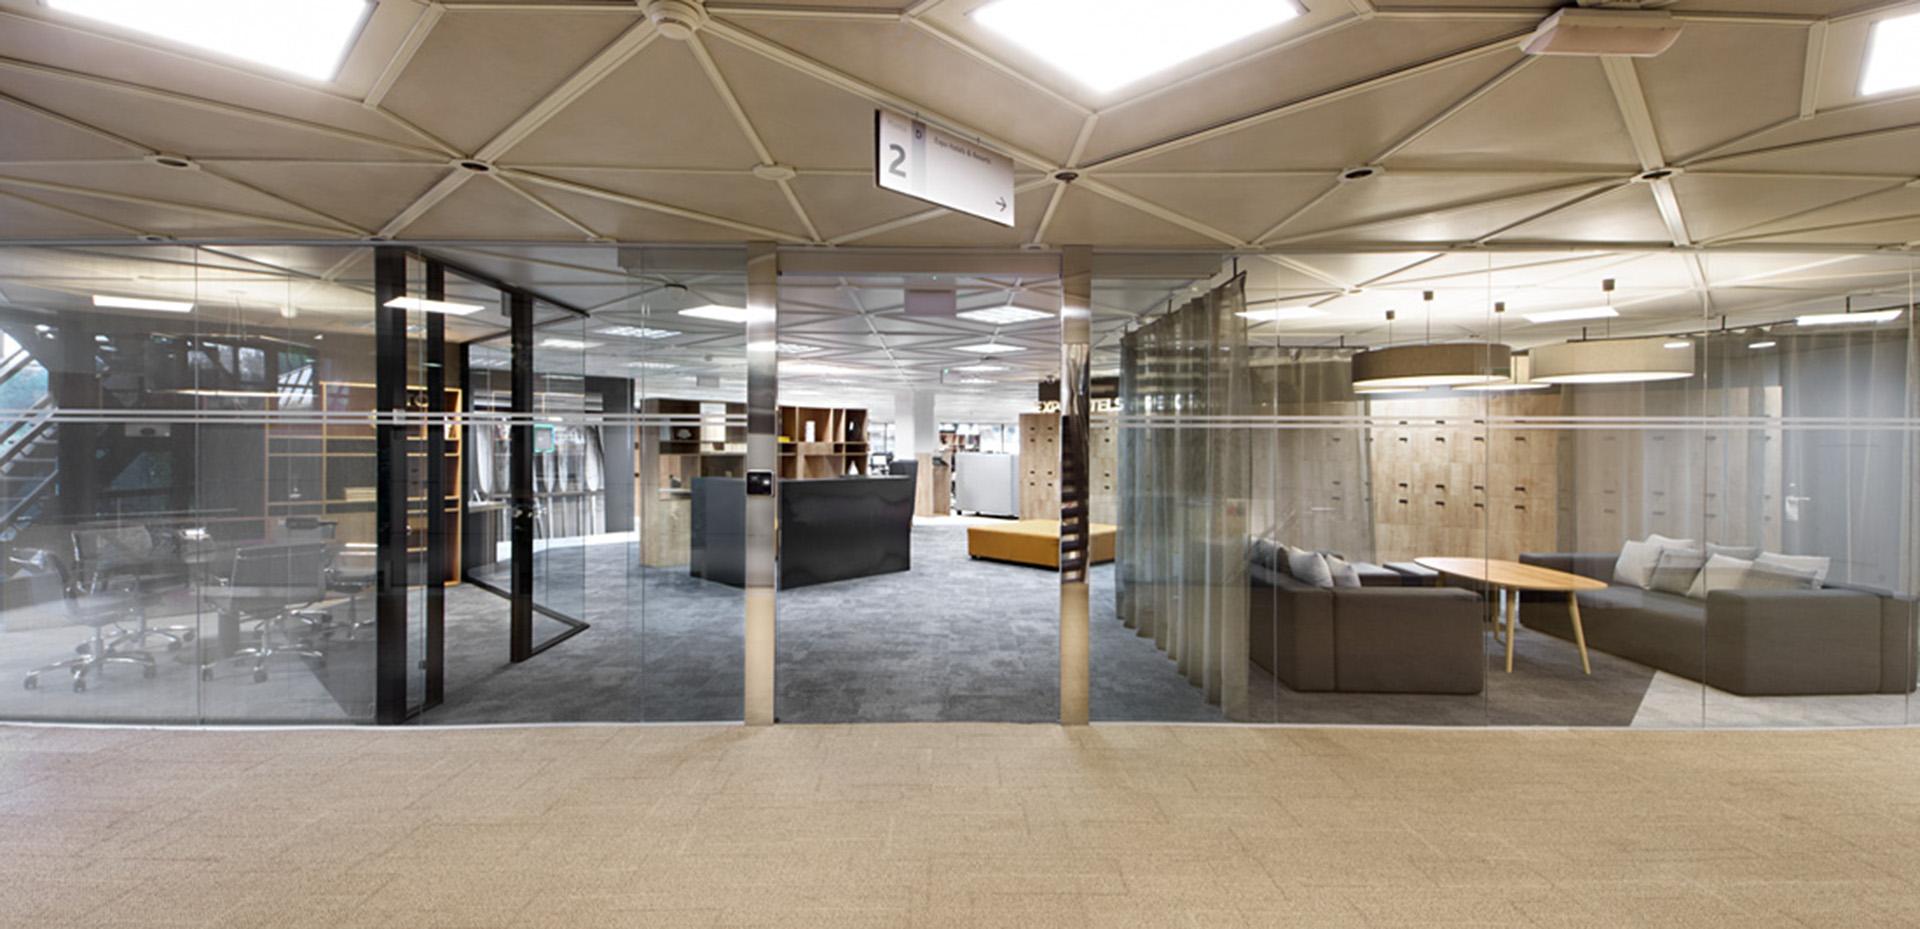 Empresas interiorismo barcelona ideas de disenos for Blau hotels oficinas centrales